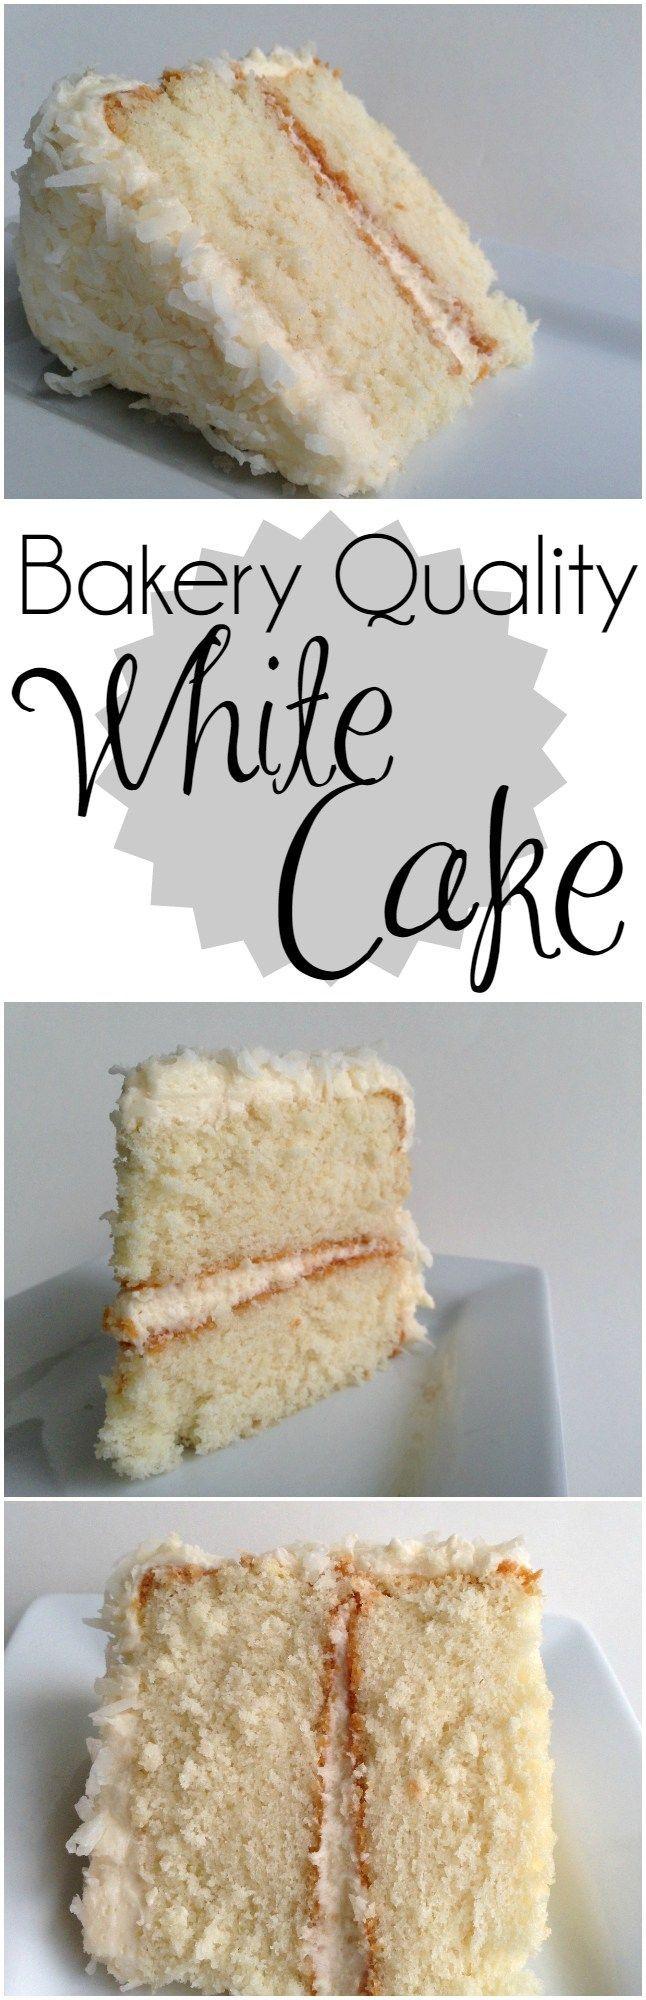 76 best White cake recipes images on Pinterest | Dessert recipes ...